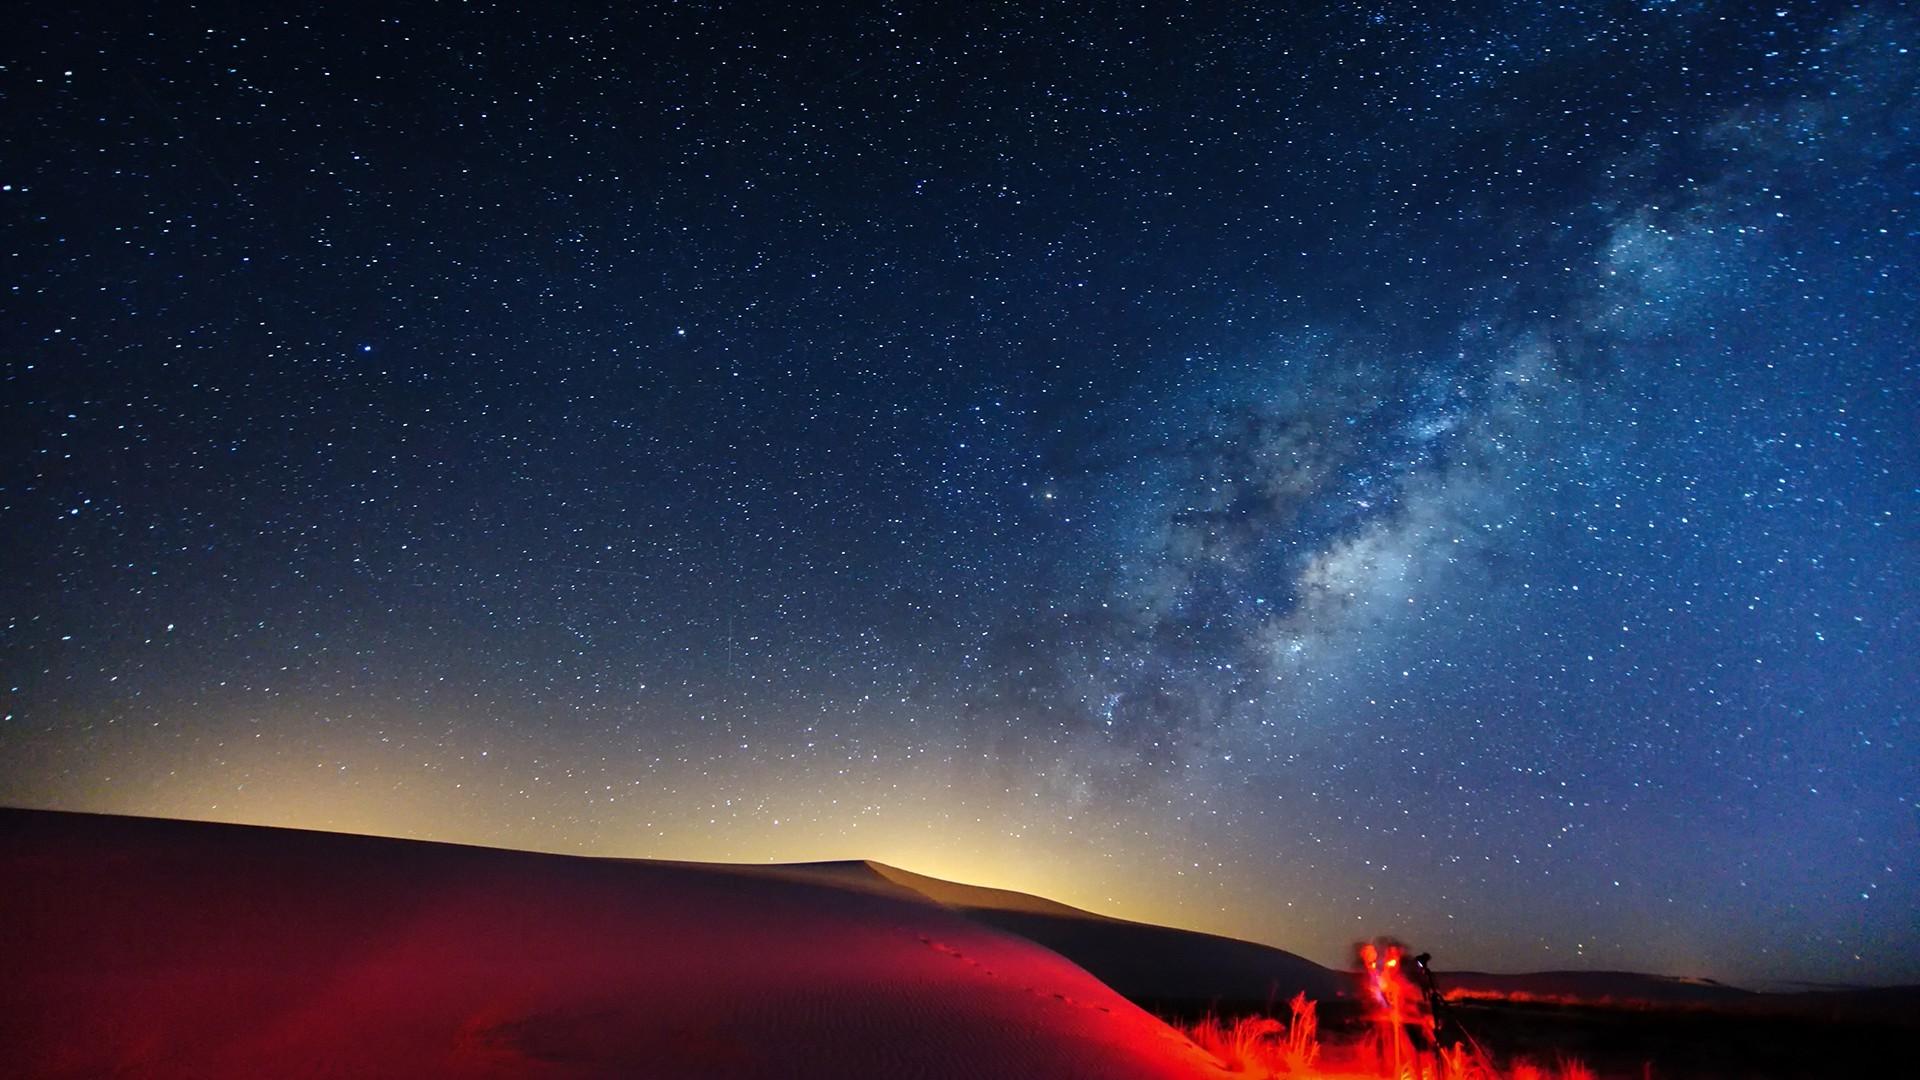 Milky Way Galaxy From Earth Wallpaper Hd Water World